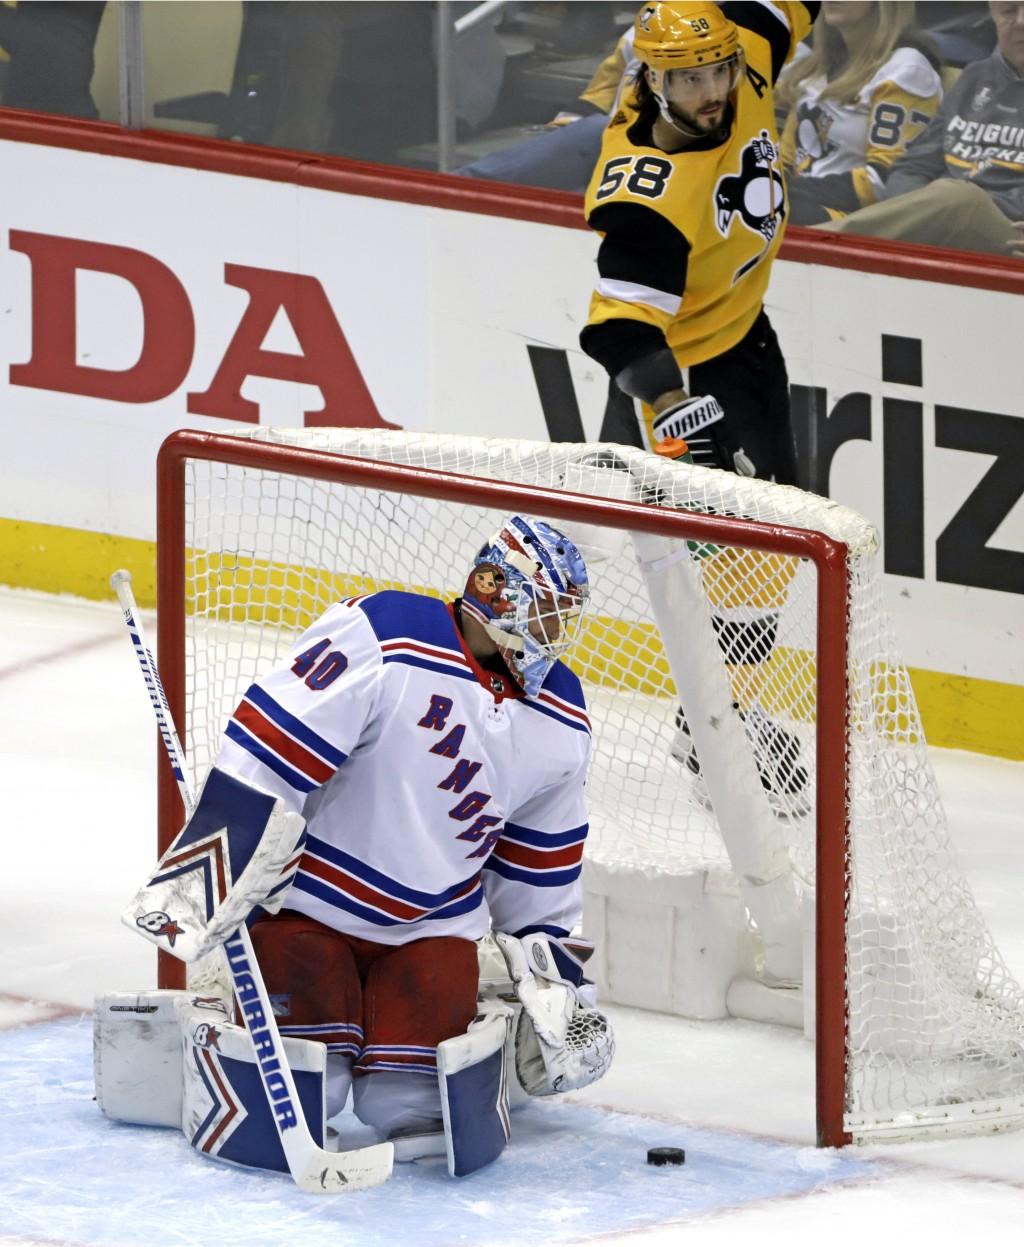 Pittsburgh Penguins' Kris Letang (58) celebrates his goal against New York Rangers' Alexandar Georgiev (40) during the first period of an NHL hockey g...